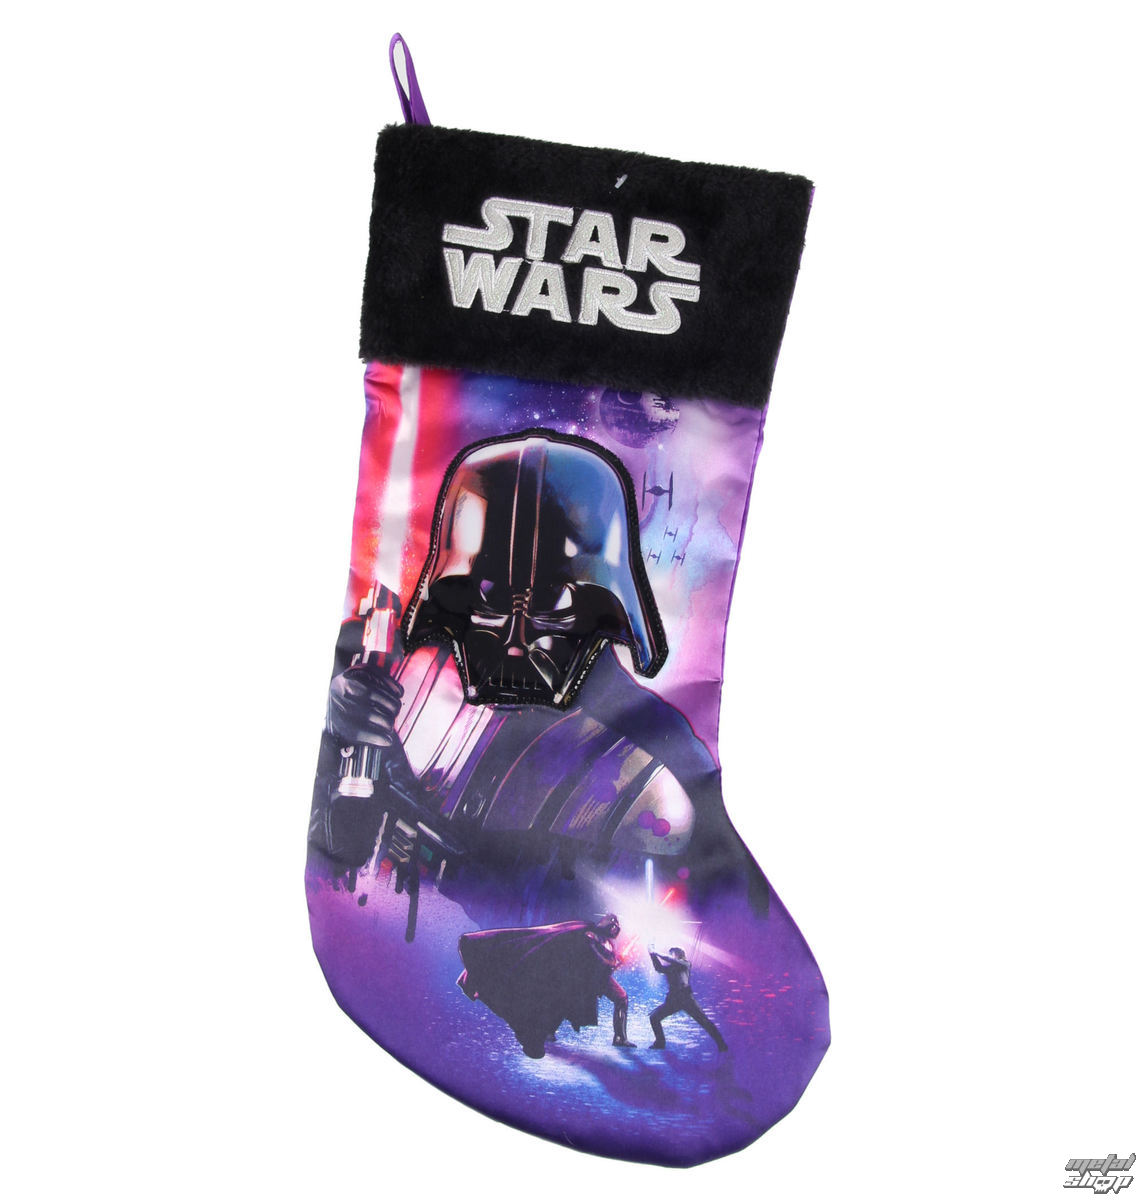 punčocha na dárky Star Wars - Darth Vader - KURKSW7155A